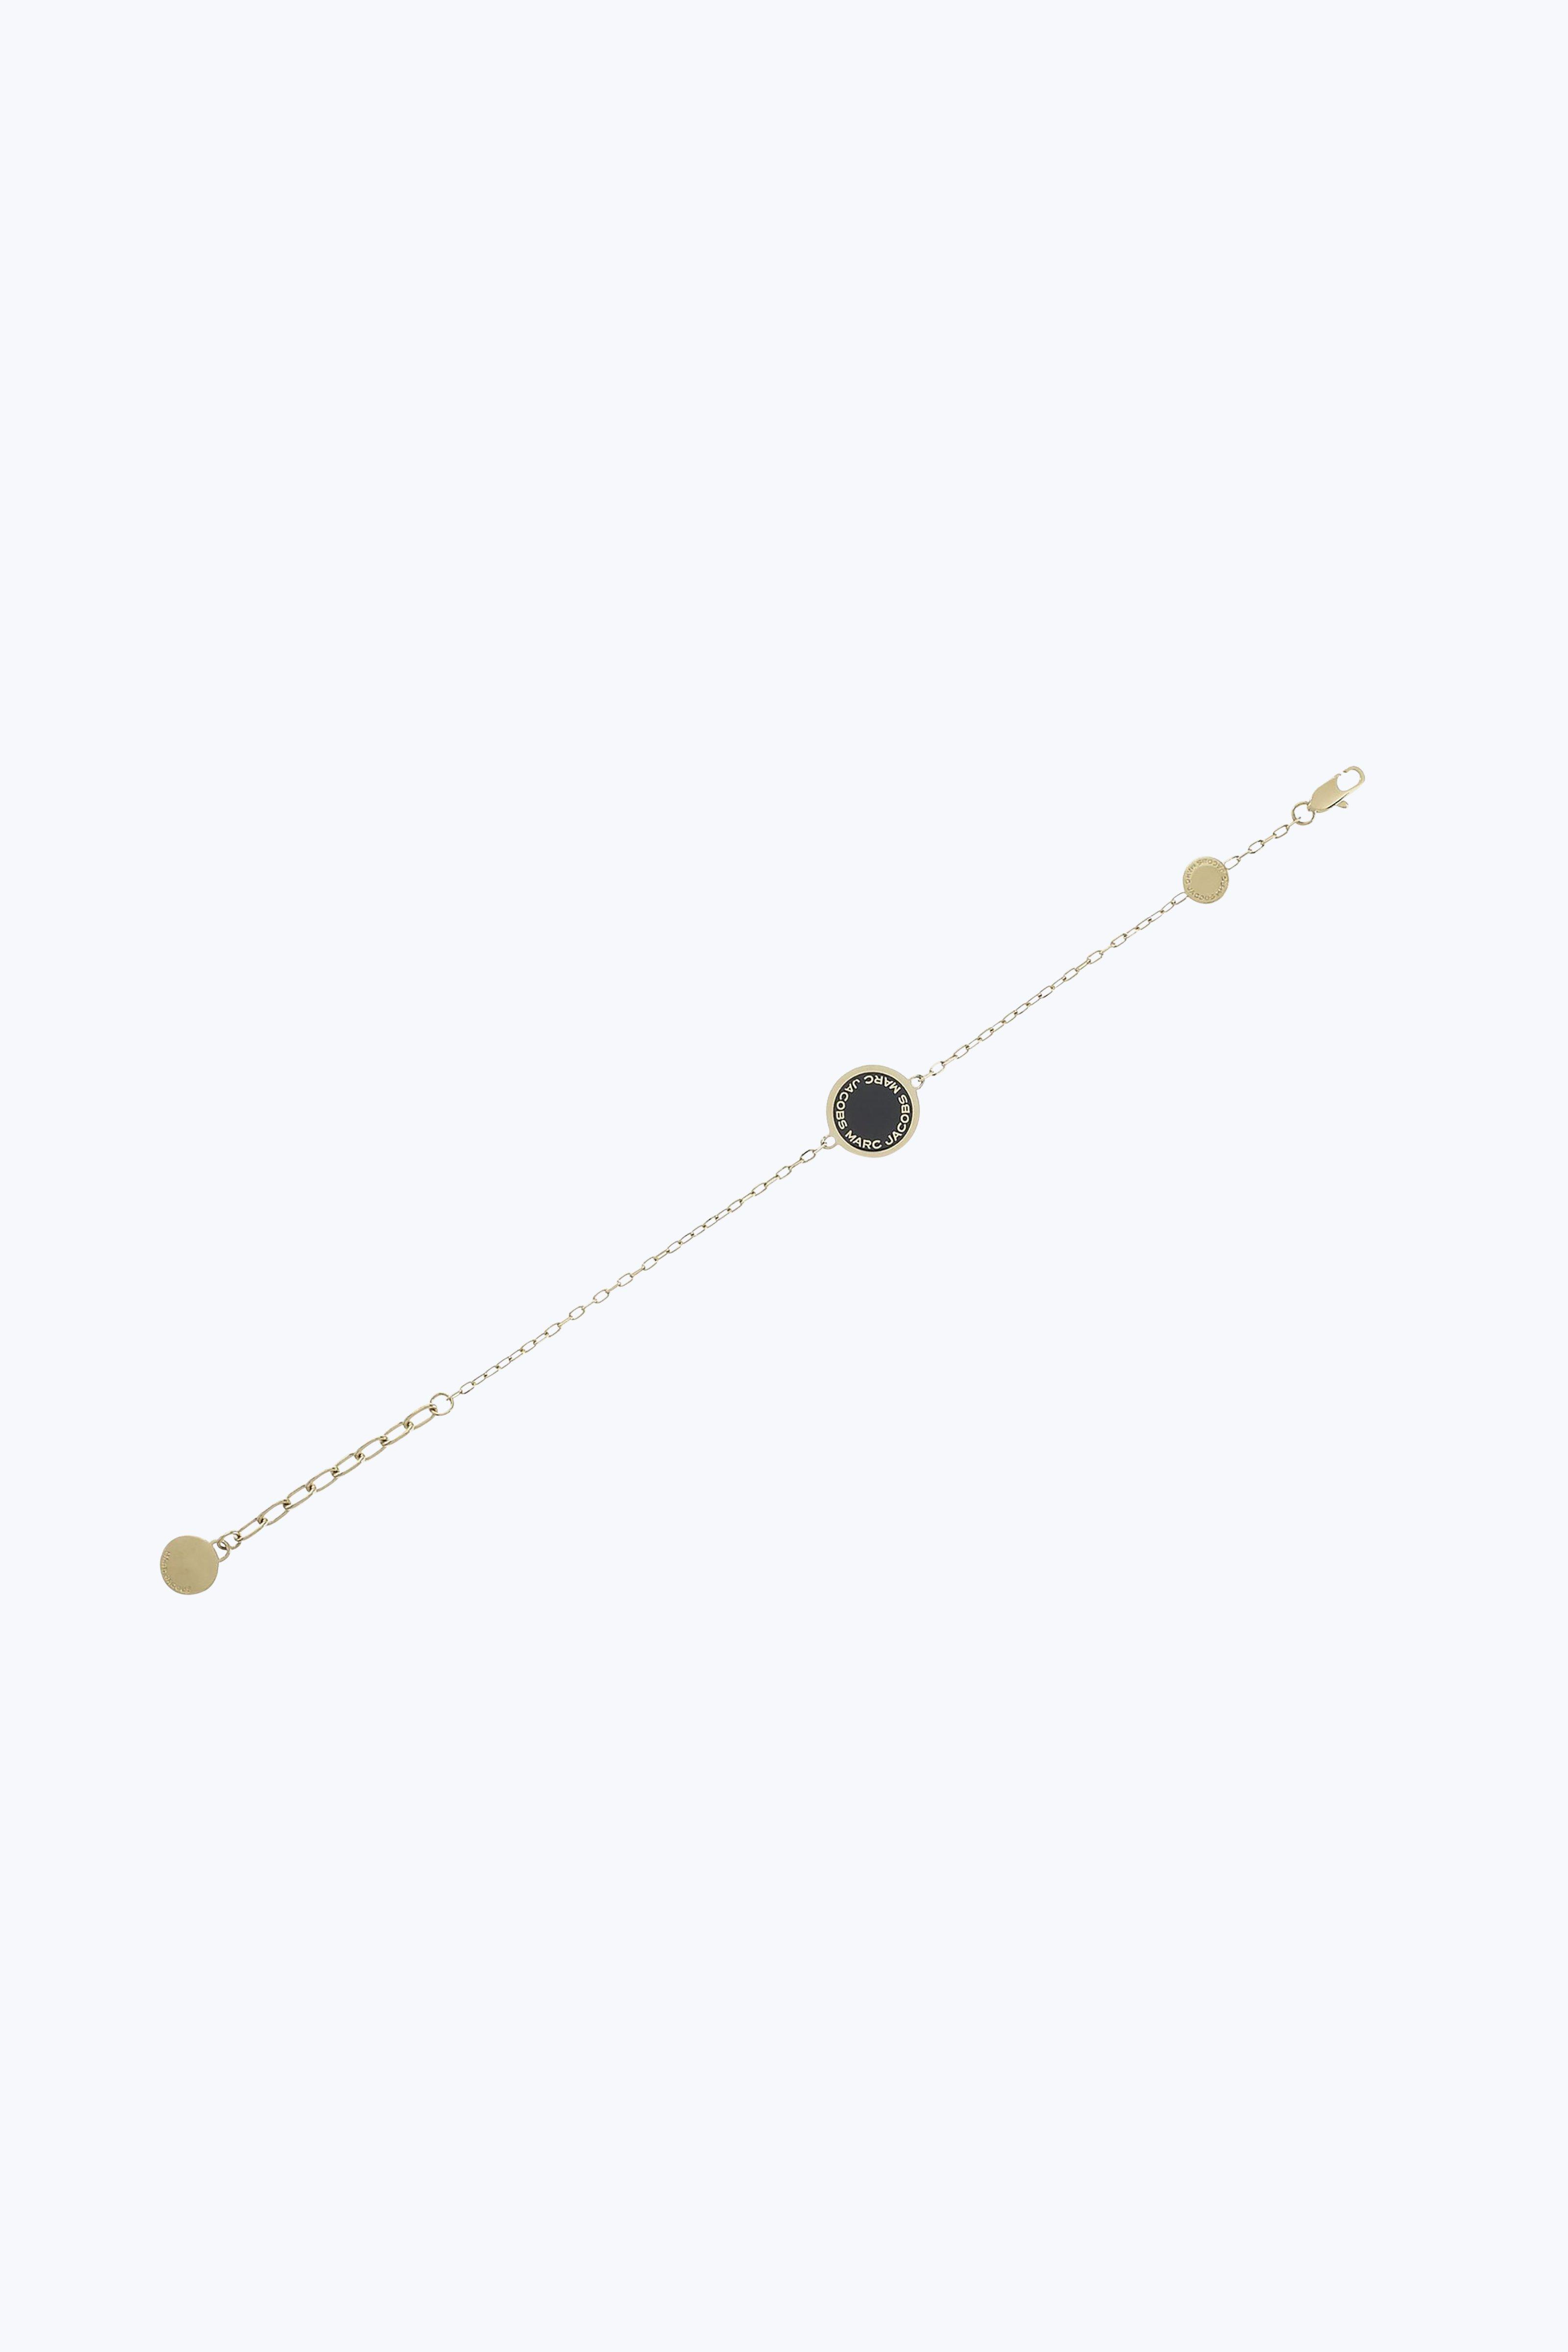 Marc Jacobs Enamel Logo Disc Bracelet In Black/Oro